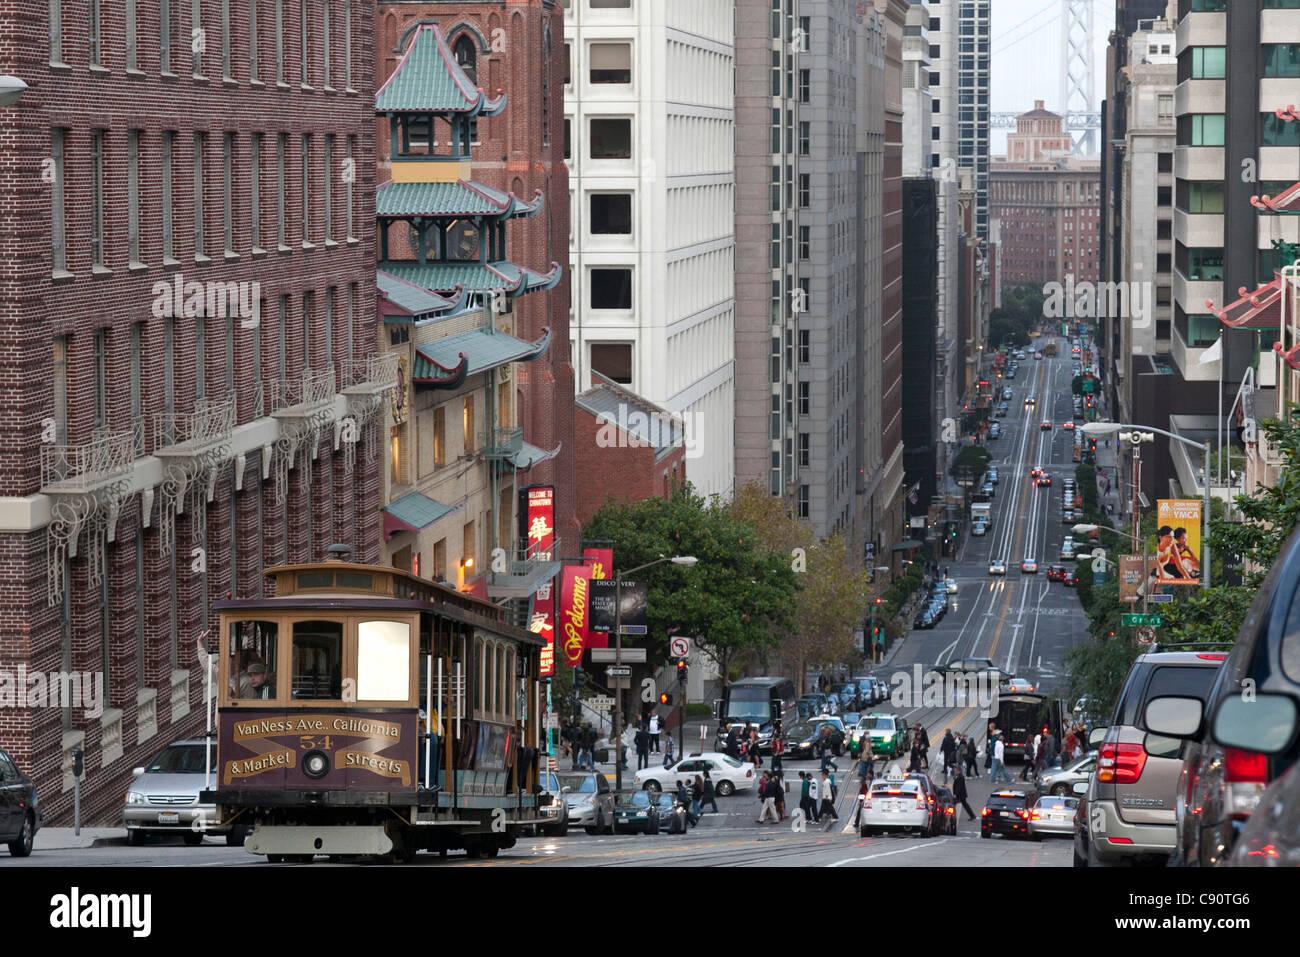 Car Dashboard Wallpaper Traditional Tram Climbing Up A Mountain Hills In Downtown